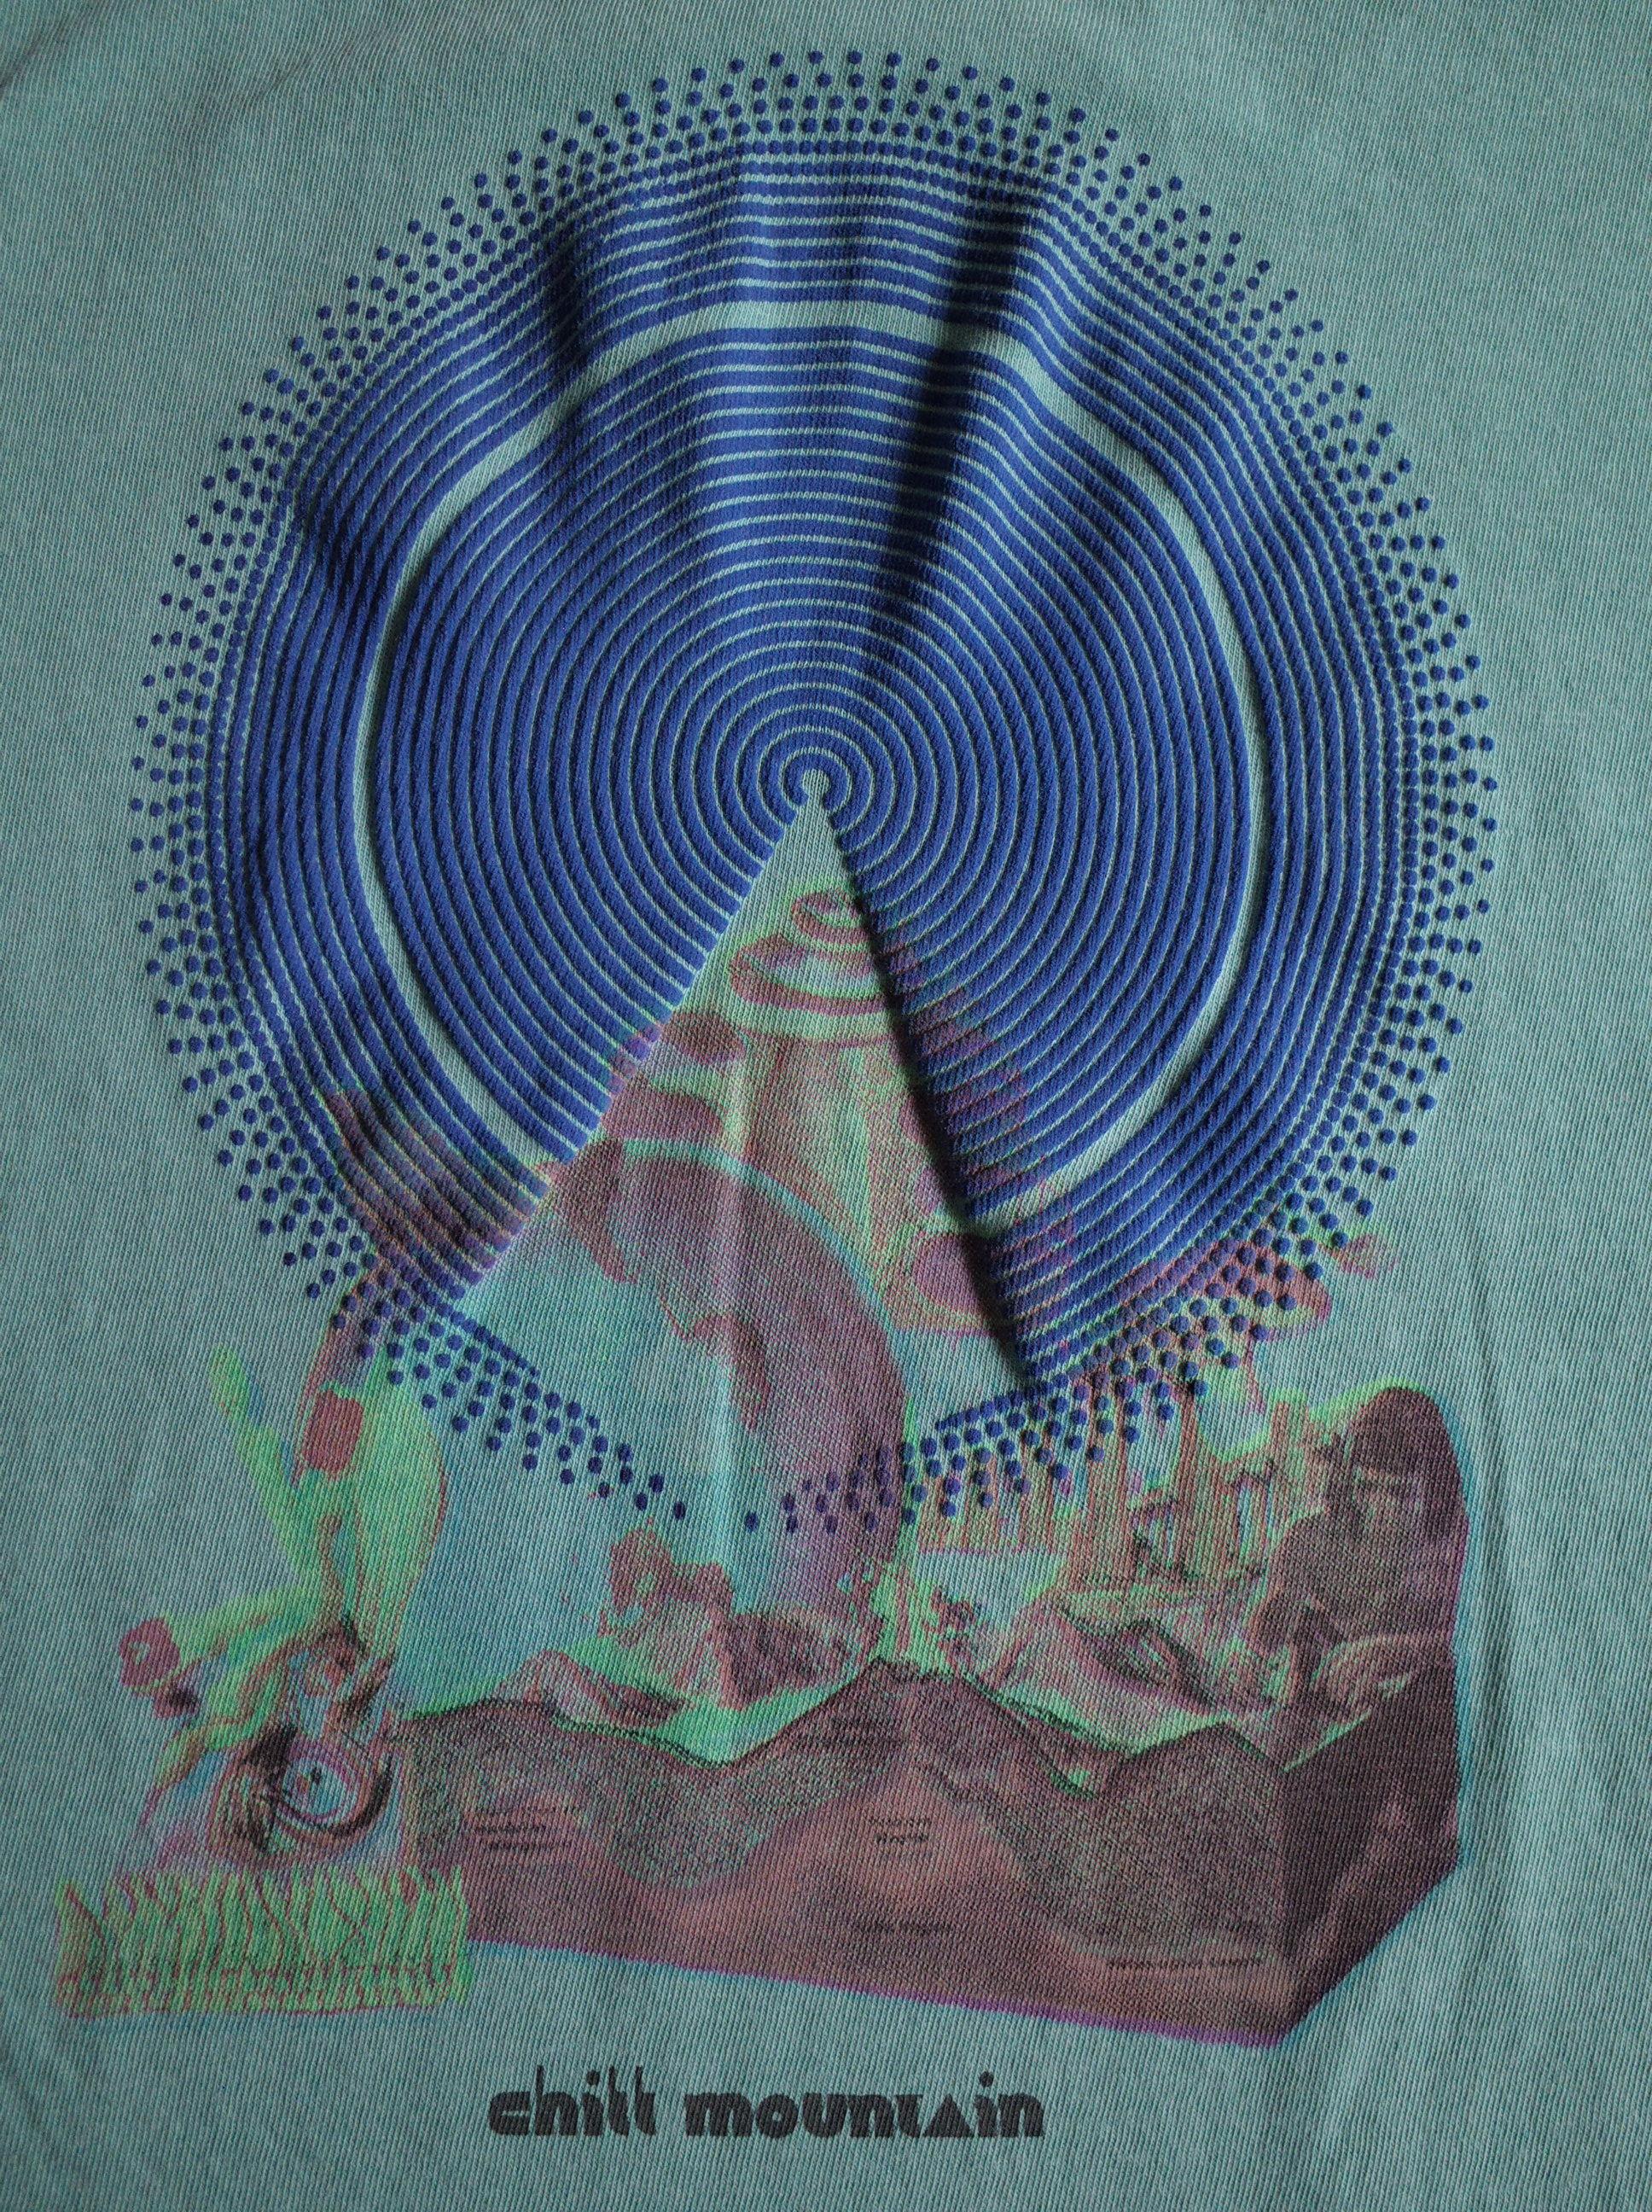 CHILL MOUNTAIN - Todobien T-shirts  WASH GREEN Size M : WEAR gallery 0